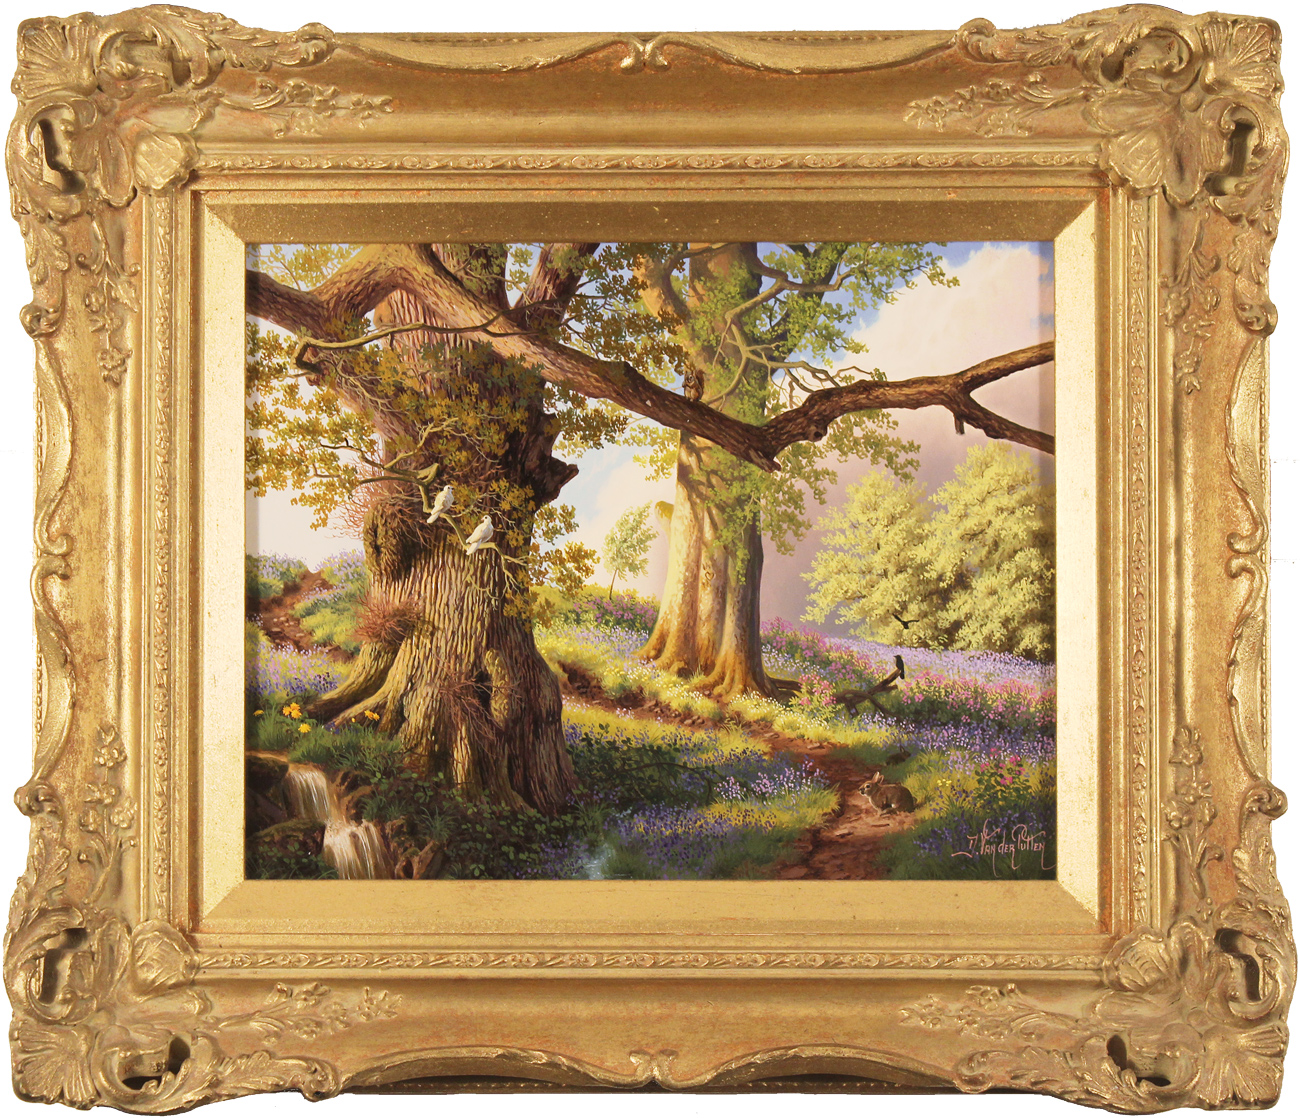 Daniel Van Der Putten, Original oil painting on panel, Spring on the Edge of Badby woods, Northamptonshire Click to enlarge